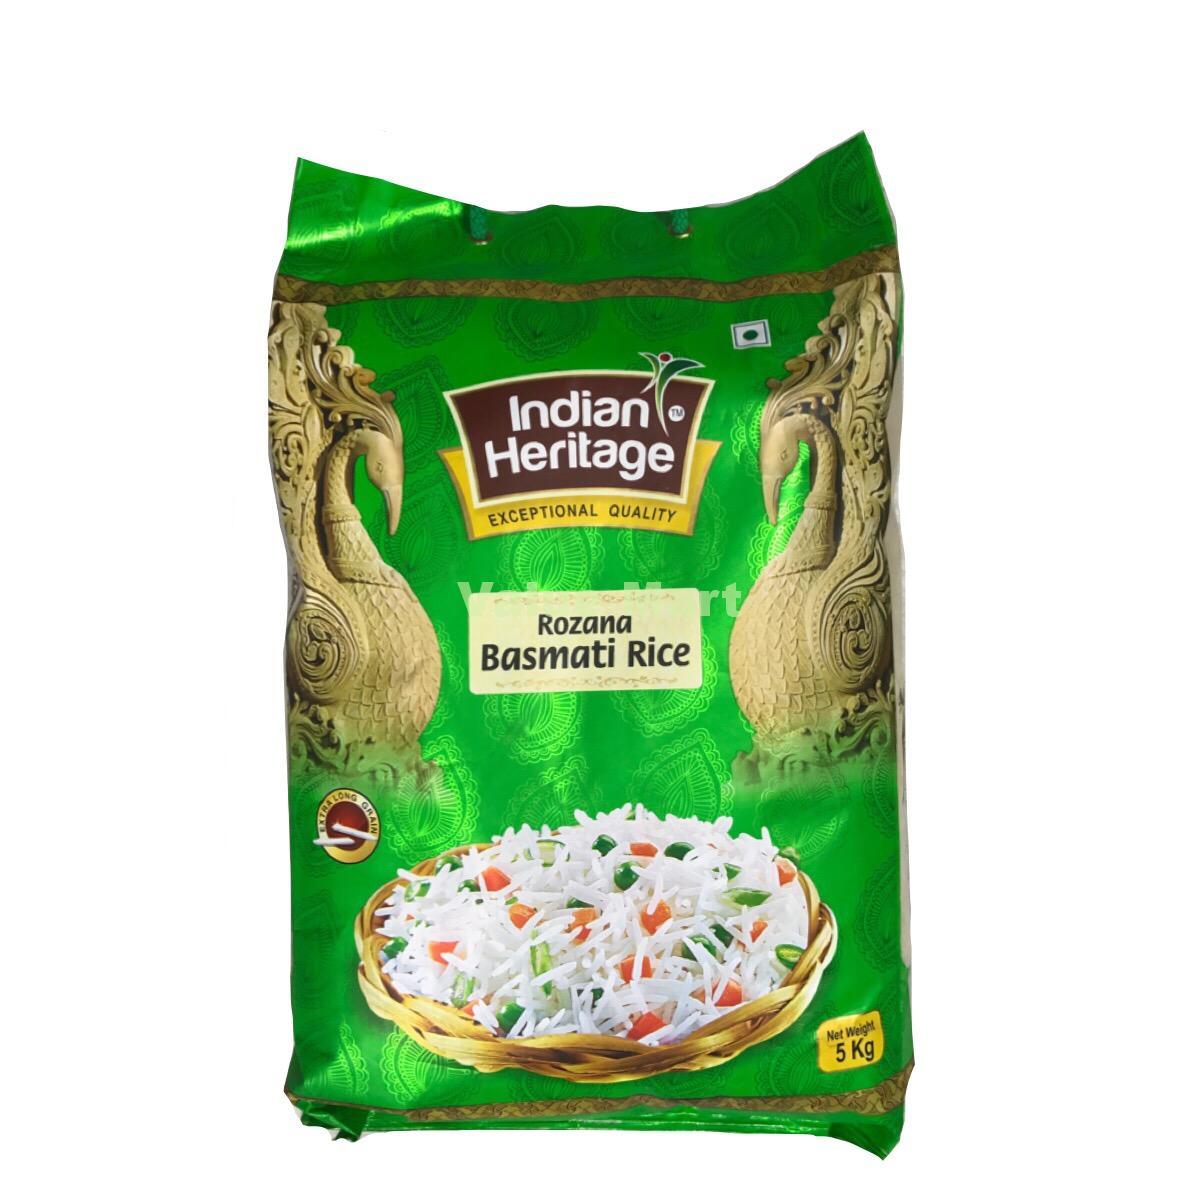 Indian Heritage Rozana Basmati Rice 20kg